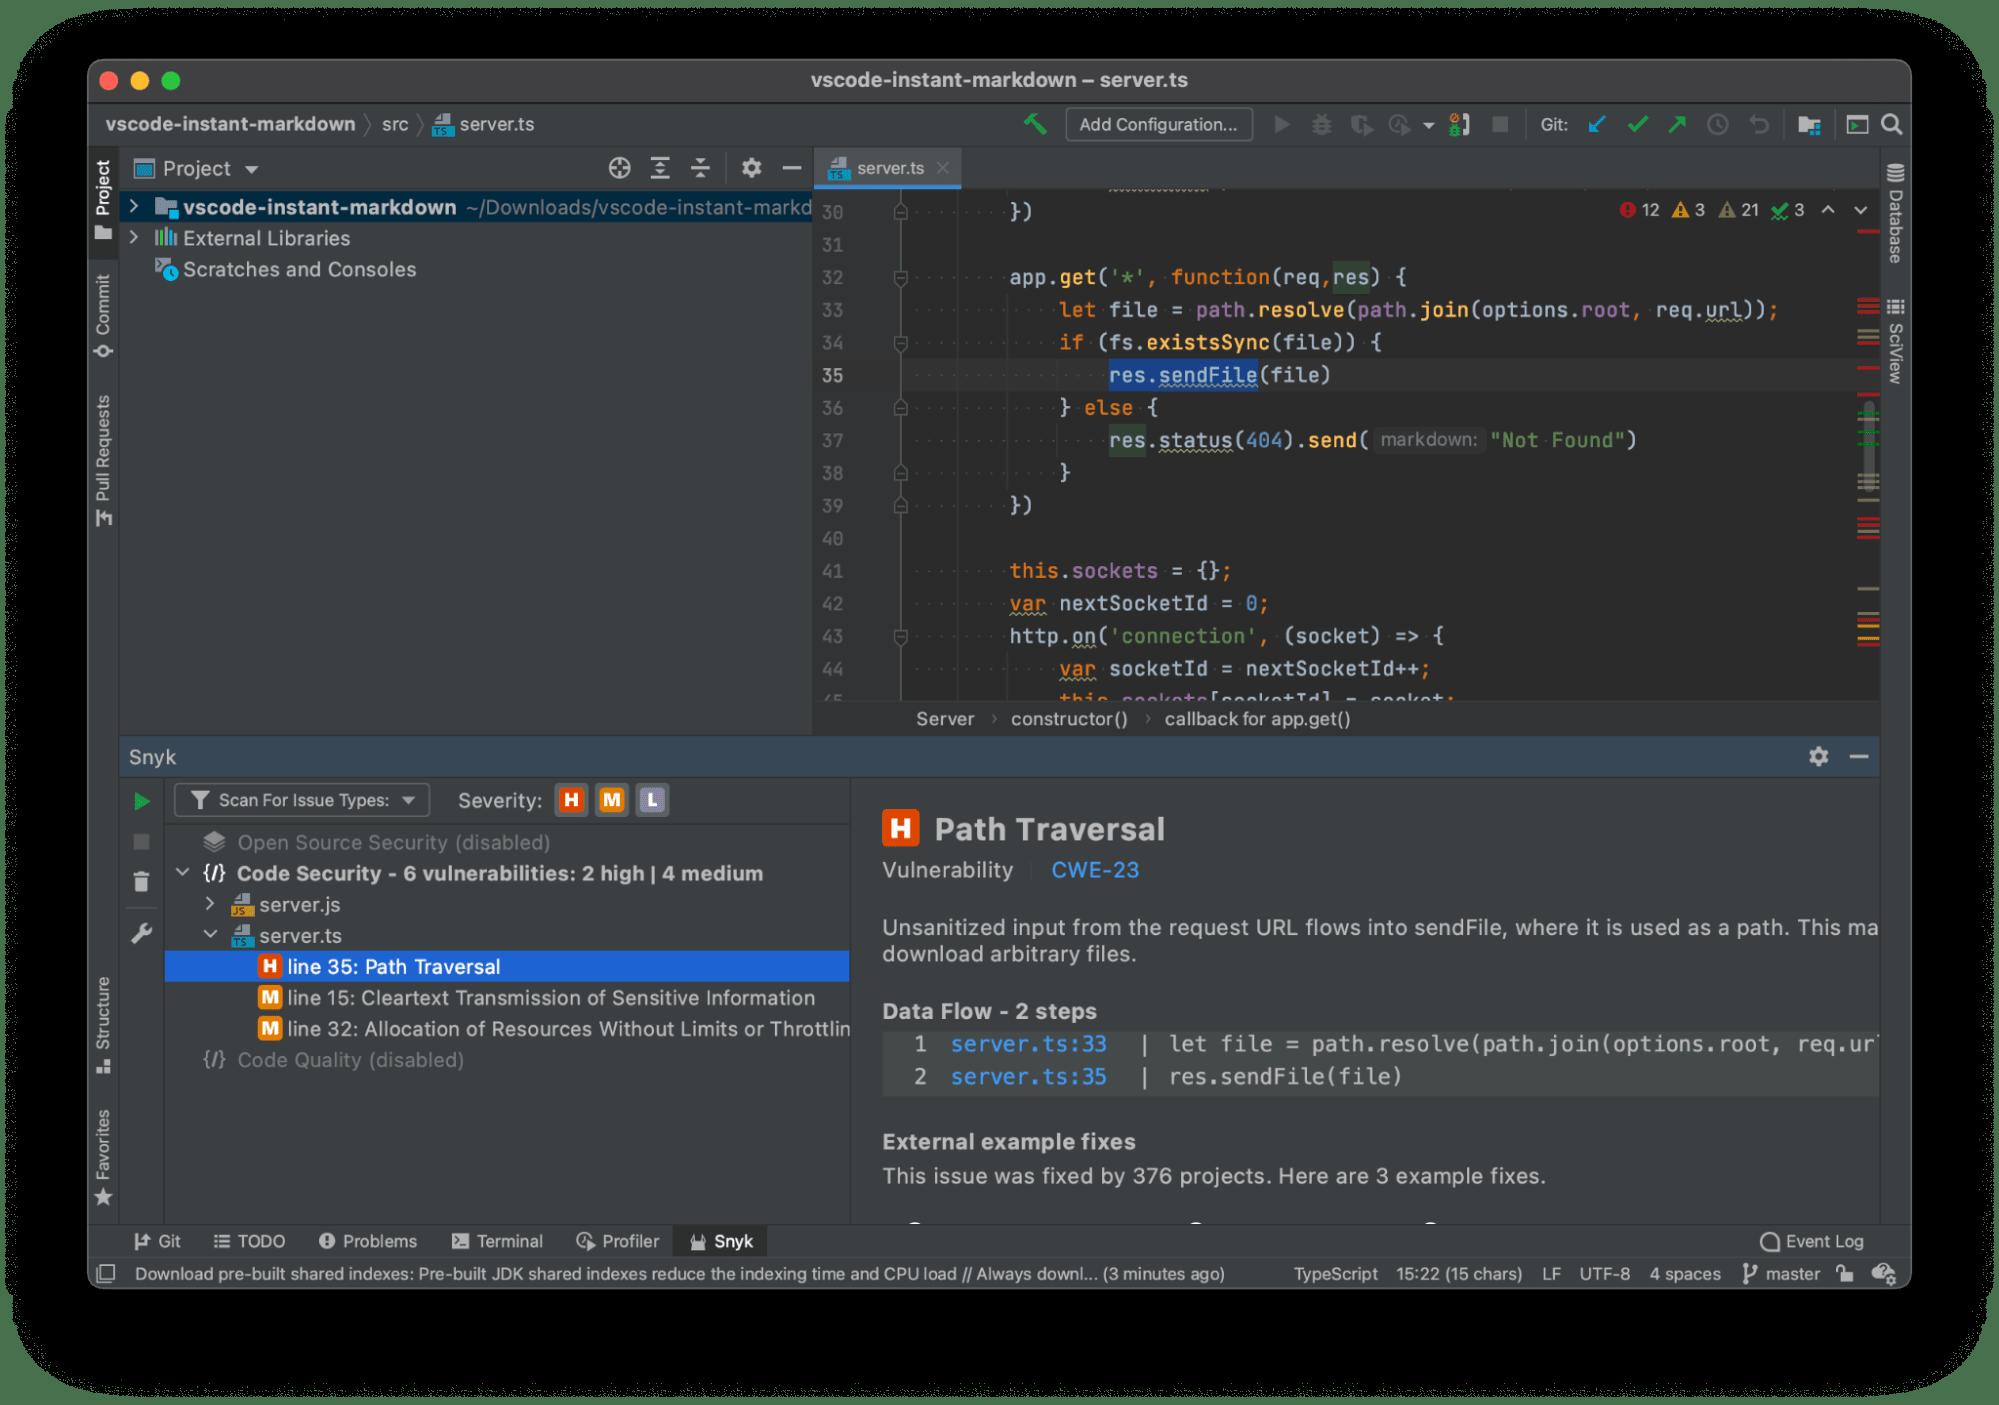 Finding path traversal vulnerabilities in VS Code IDE